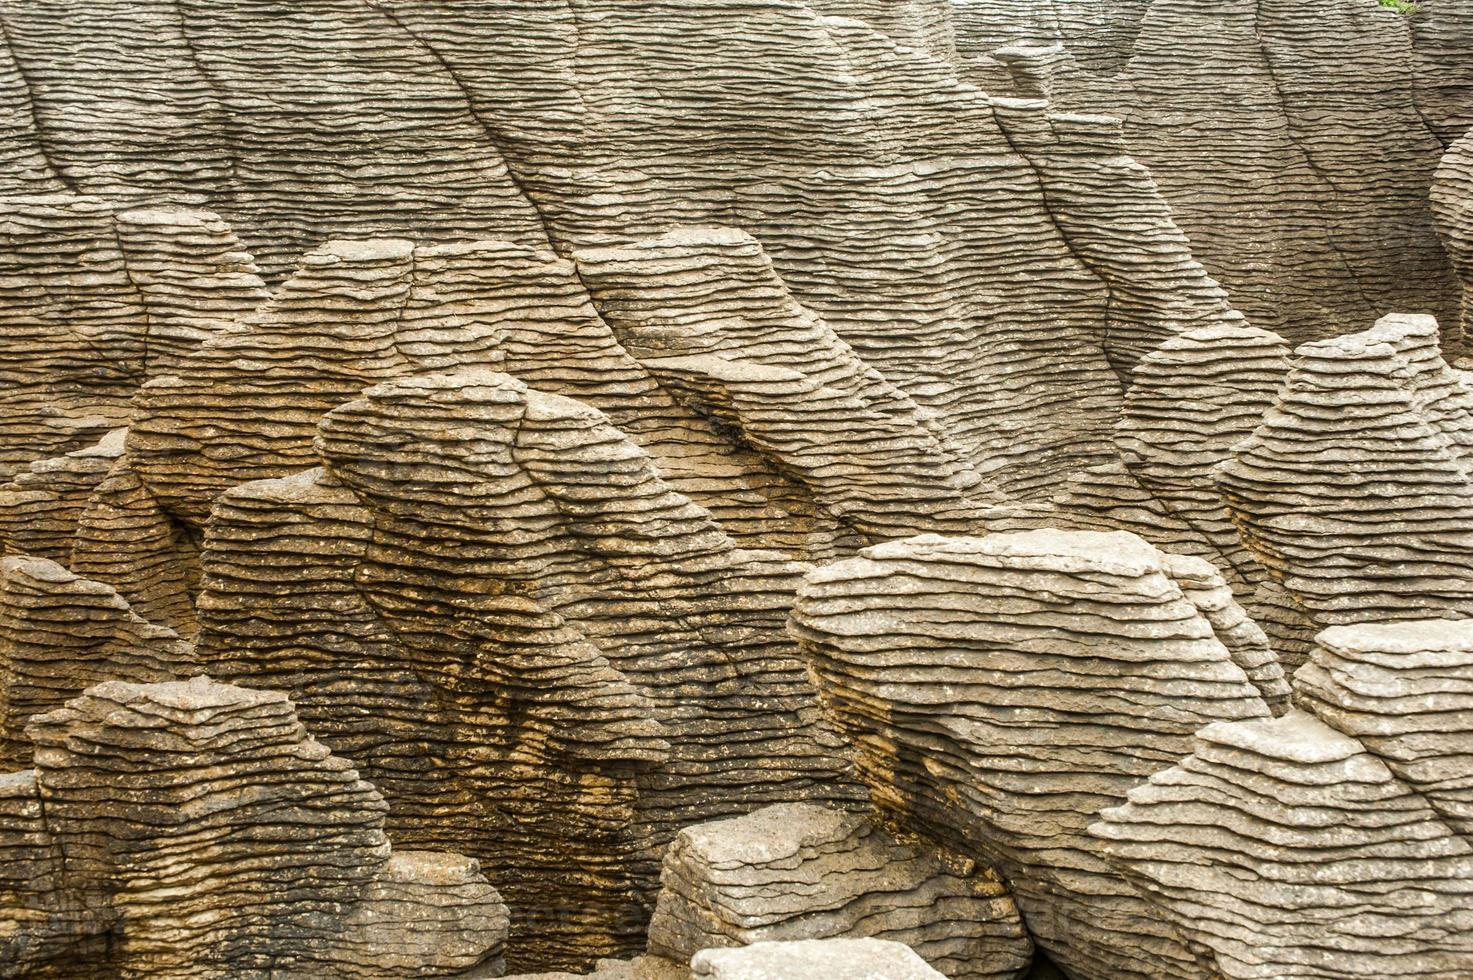 crêpe rock photo